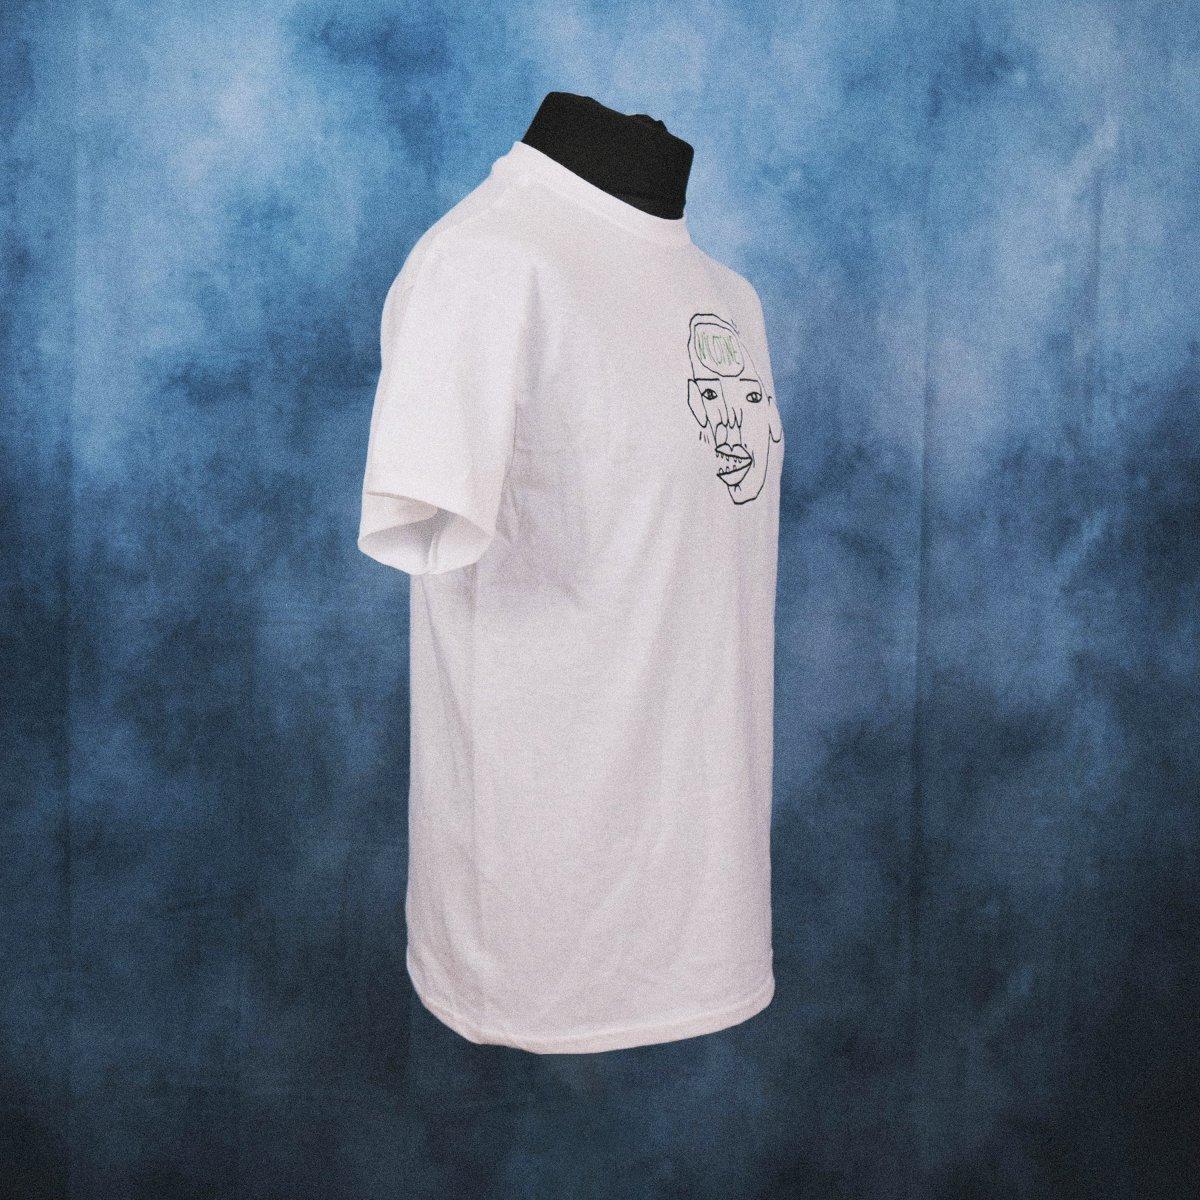 'Nicotine Head' Unisex Embroidered T-Shirt